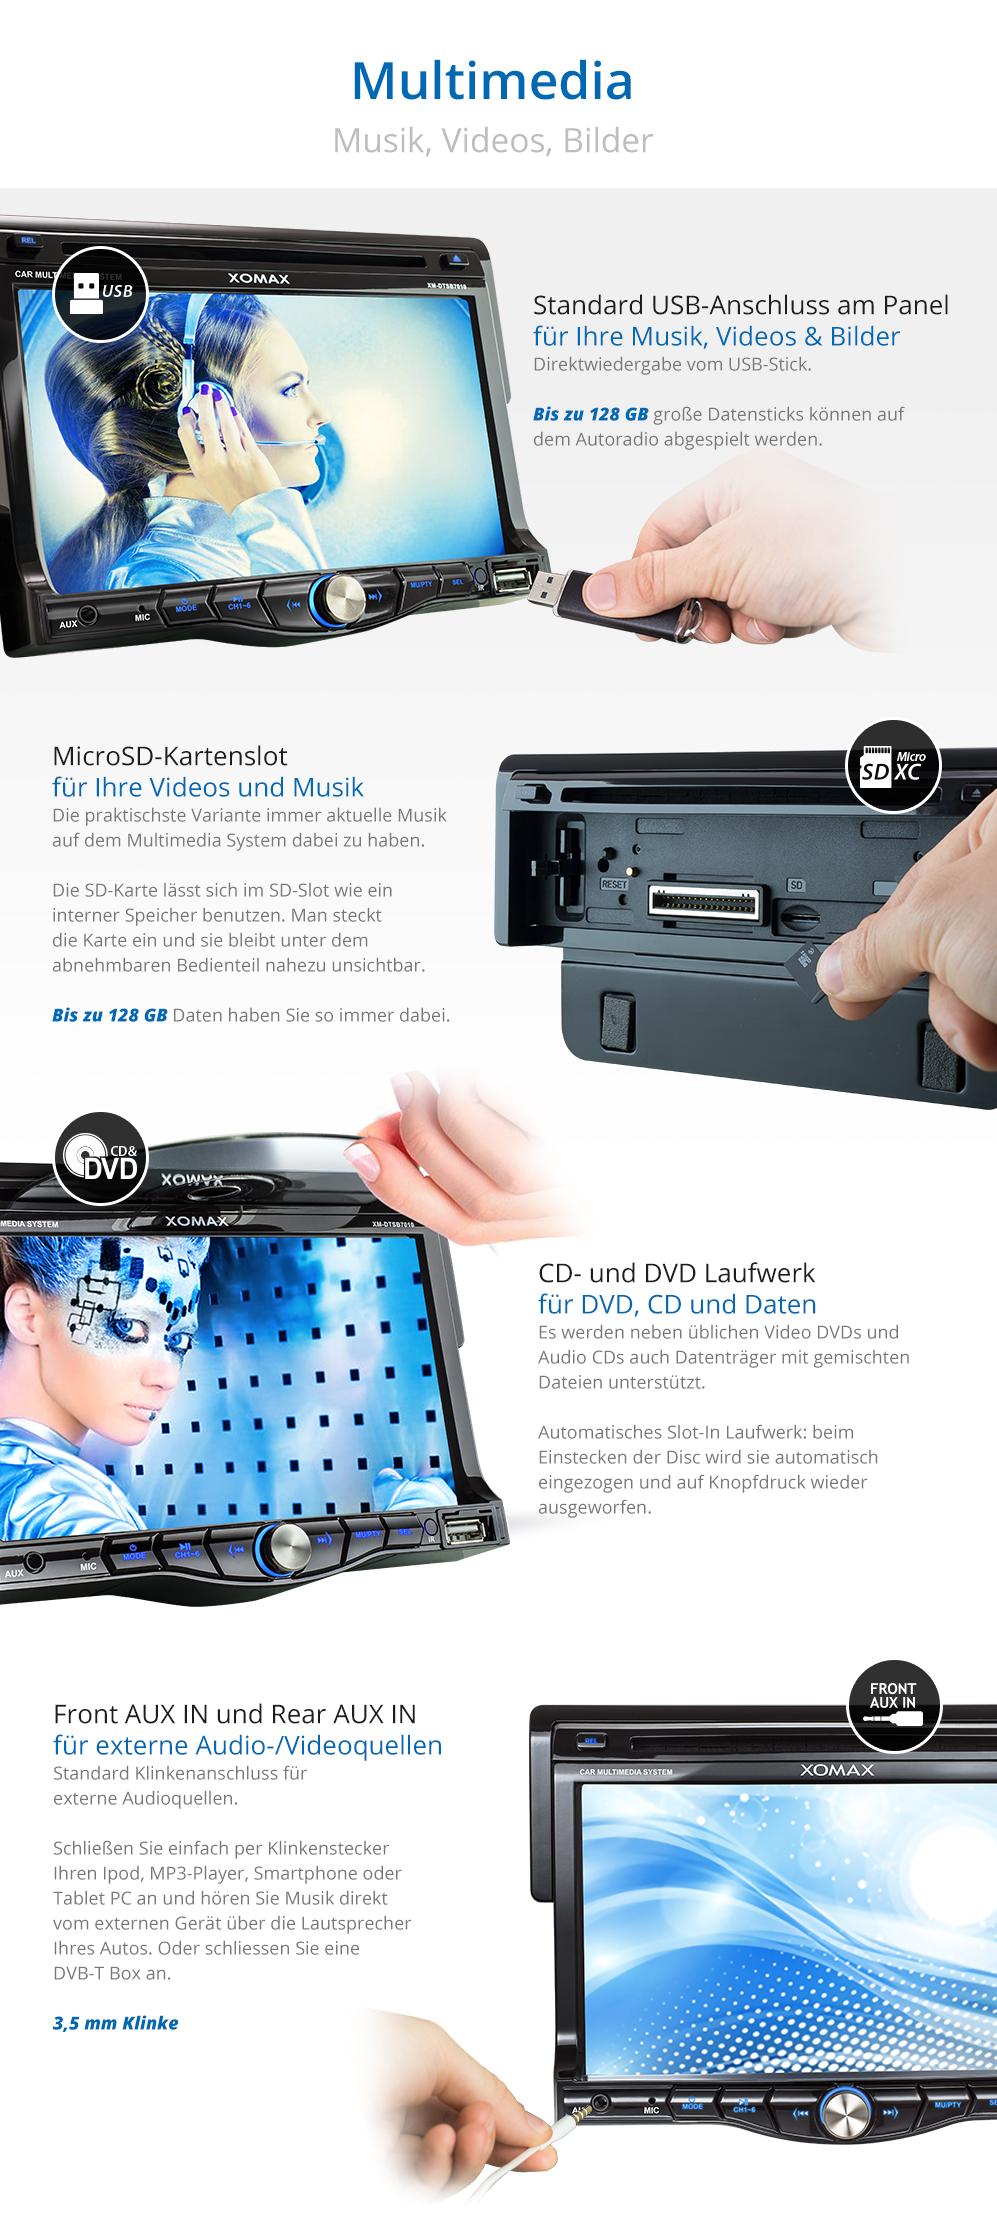 xomax xm dtsb7010 autoradio bluetooth touchscreen display. Black Bedroom Furniture Sets. Home Design Ideas